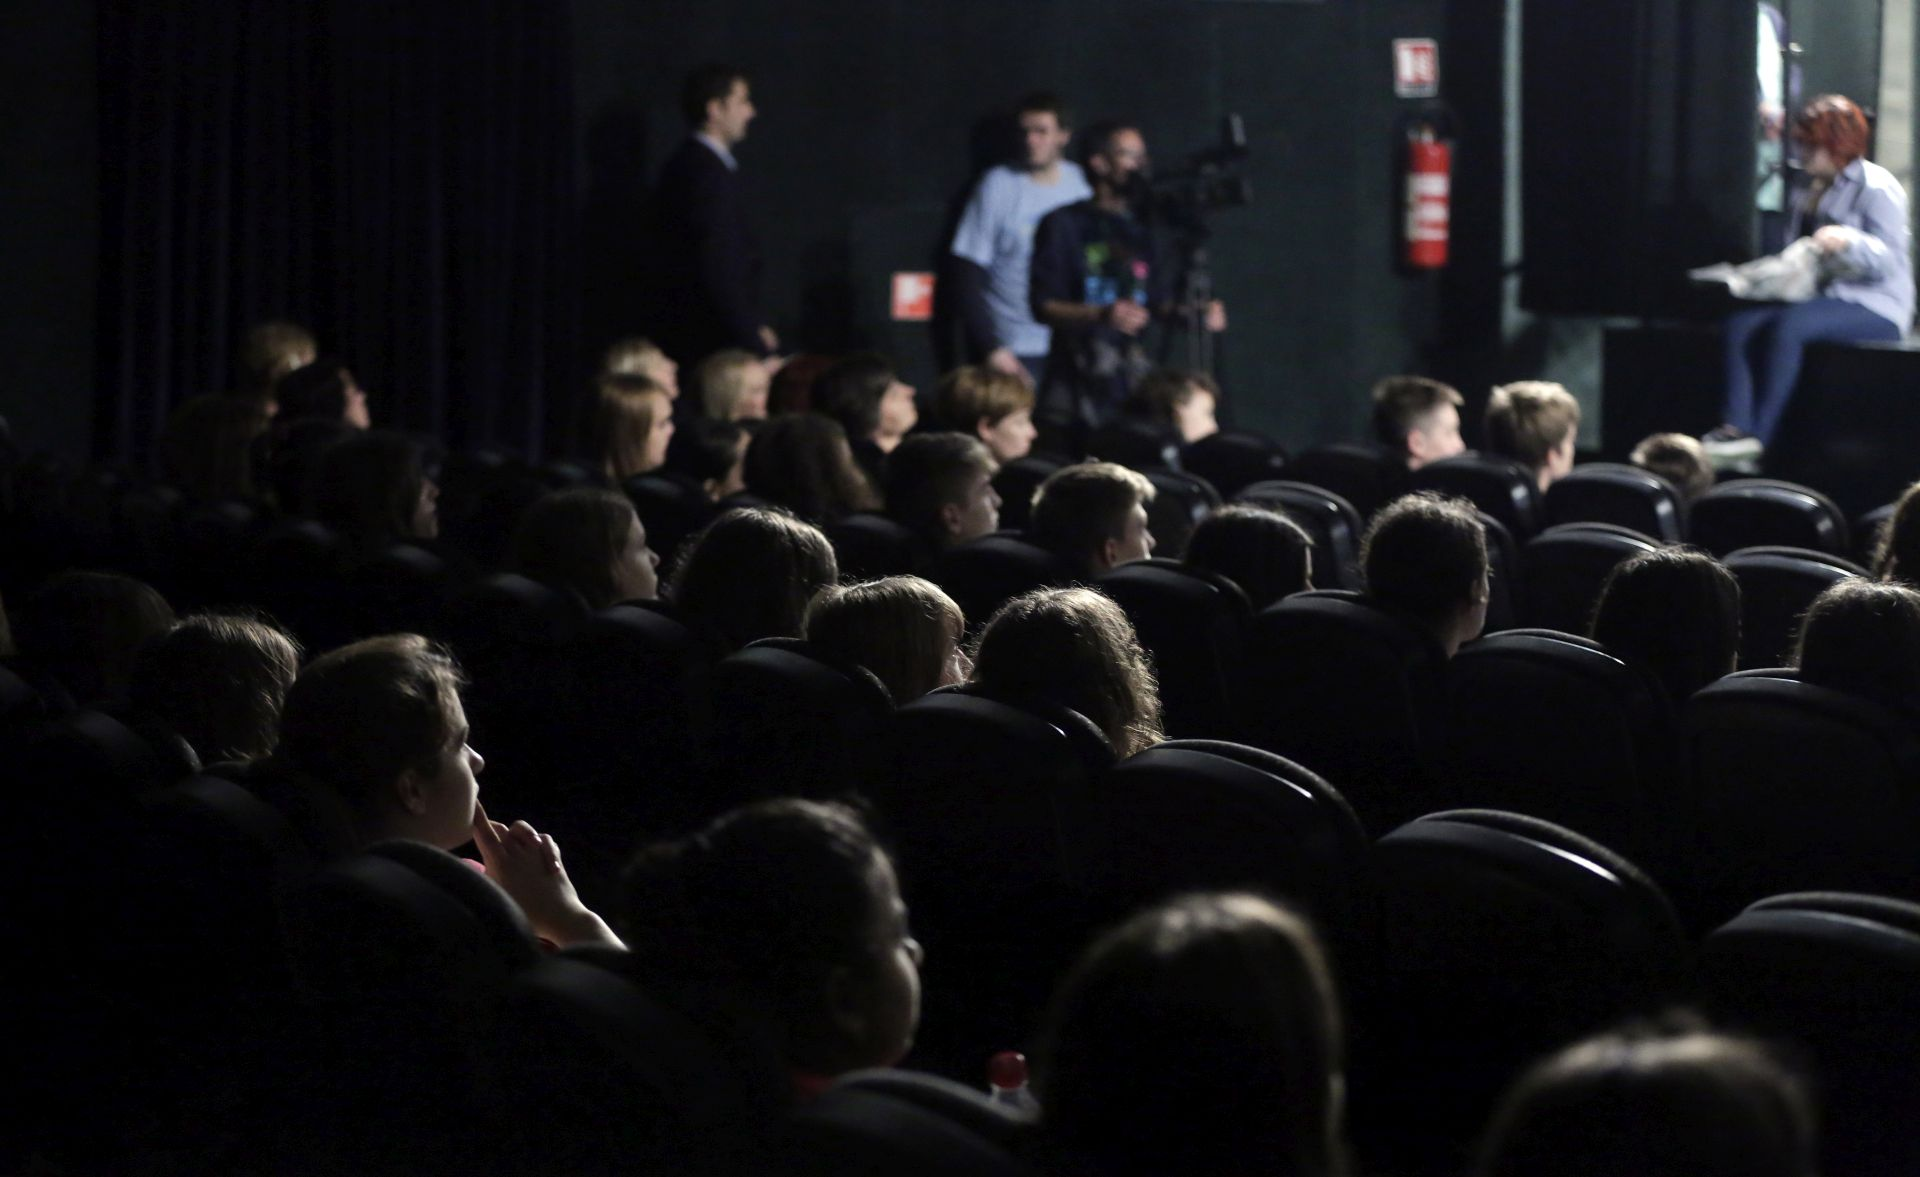 Prvi Filmski festival 'Mladi, u kino' u zagrebačkom 'Tuškancu'